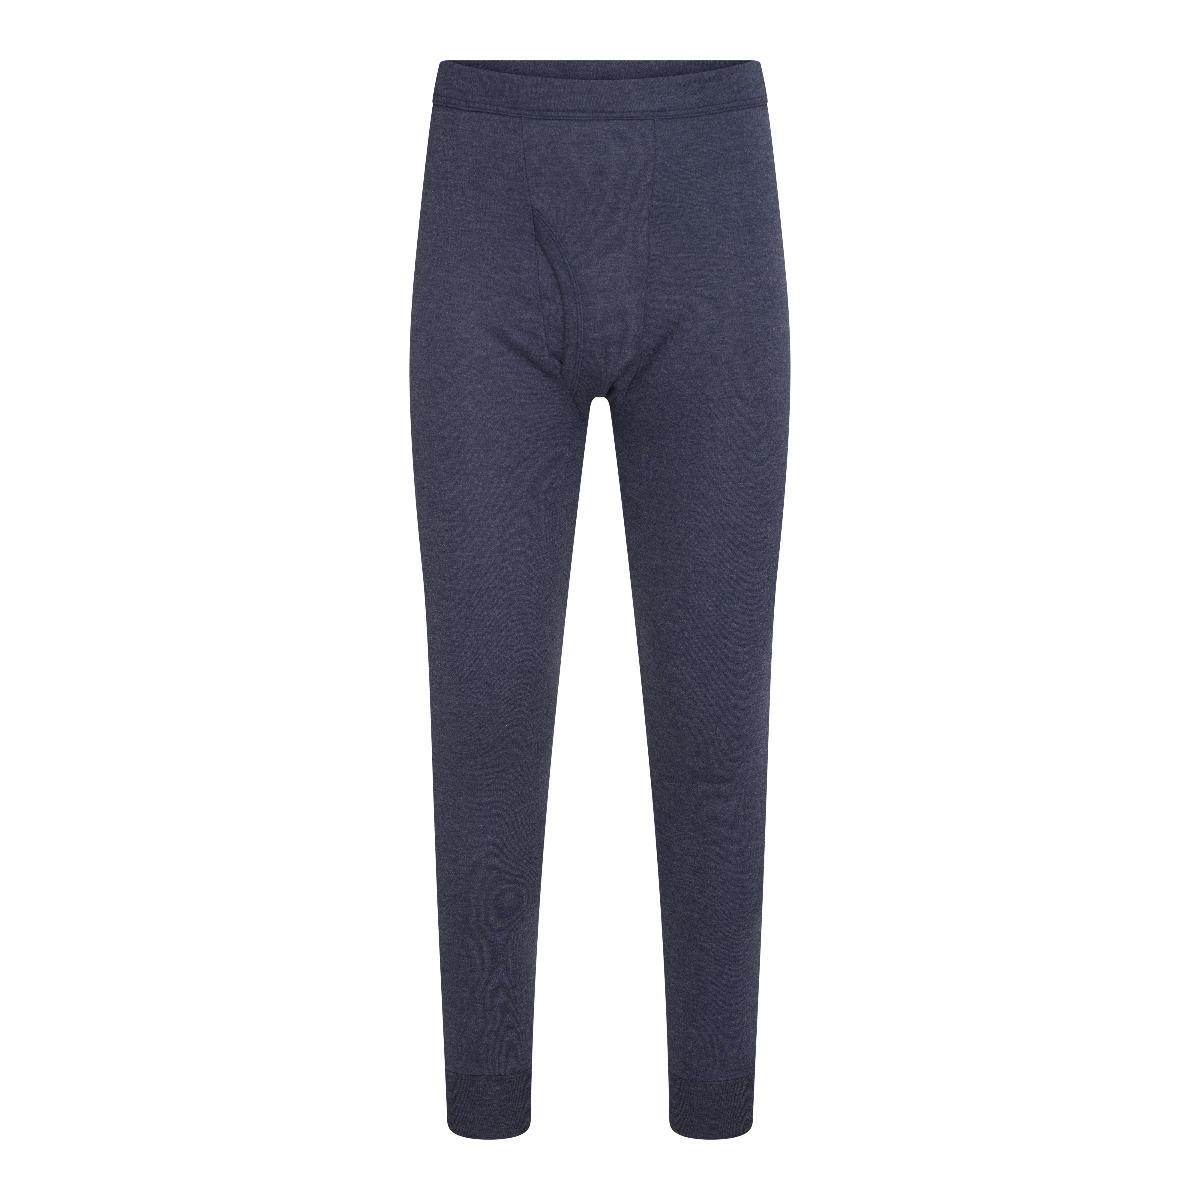 Beeren Thermo Heren Pantalon Marine XL